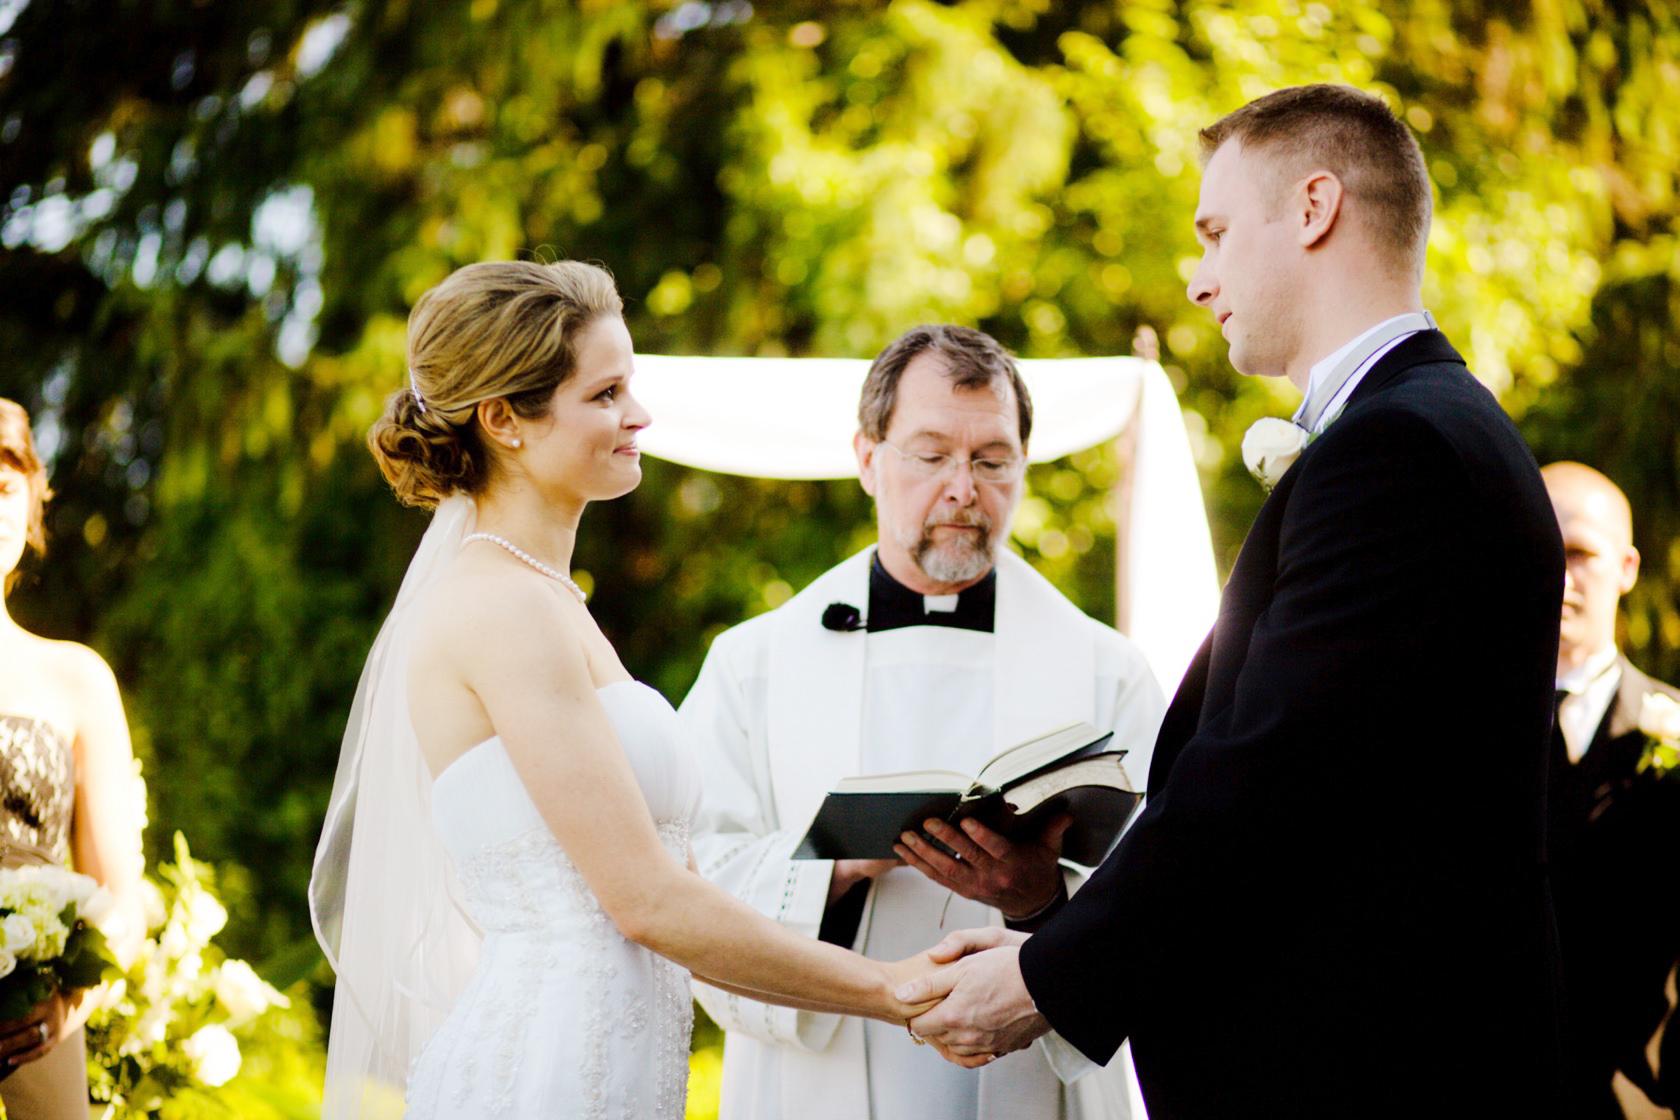 stephen sager photography 2227 toronto wedding photography